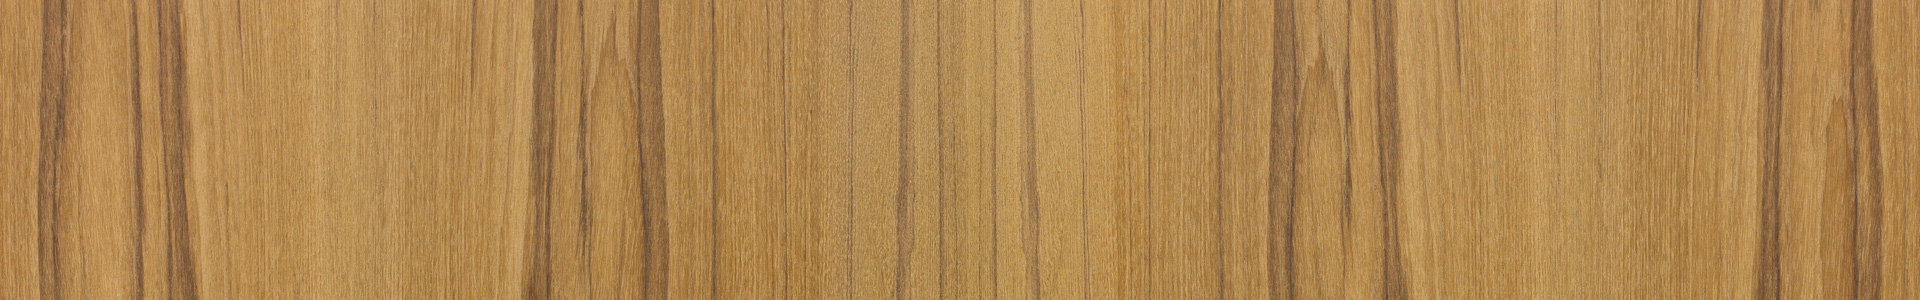 Kärnsund Wood Link - karnsund.se